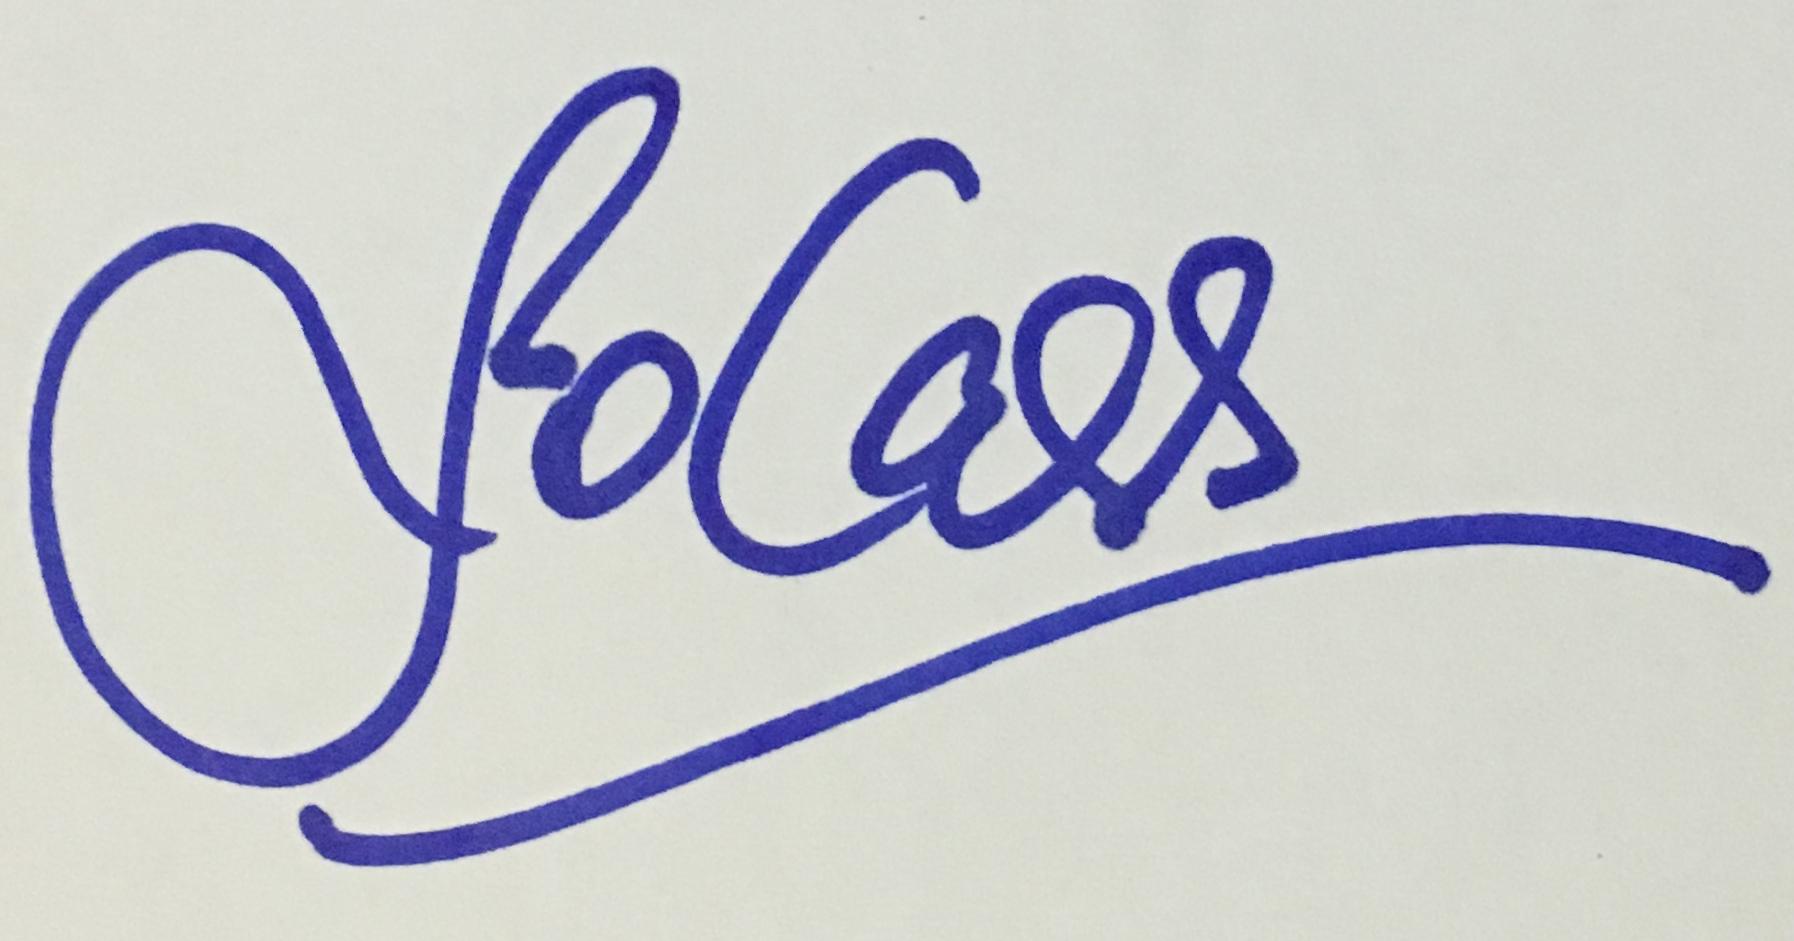 Jo Cass's Signature